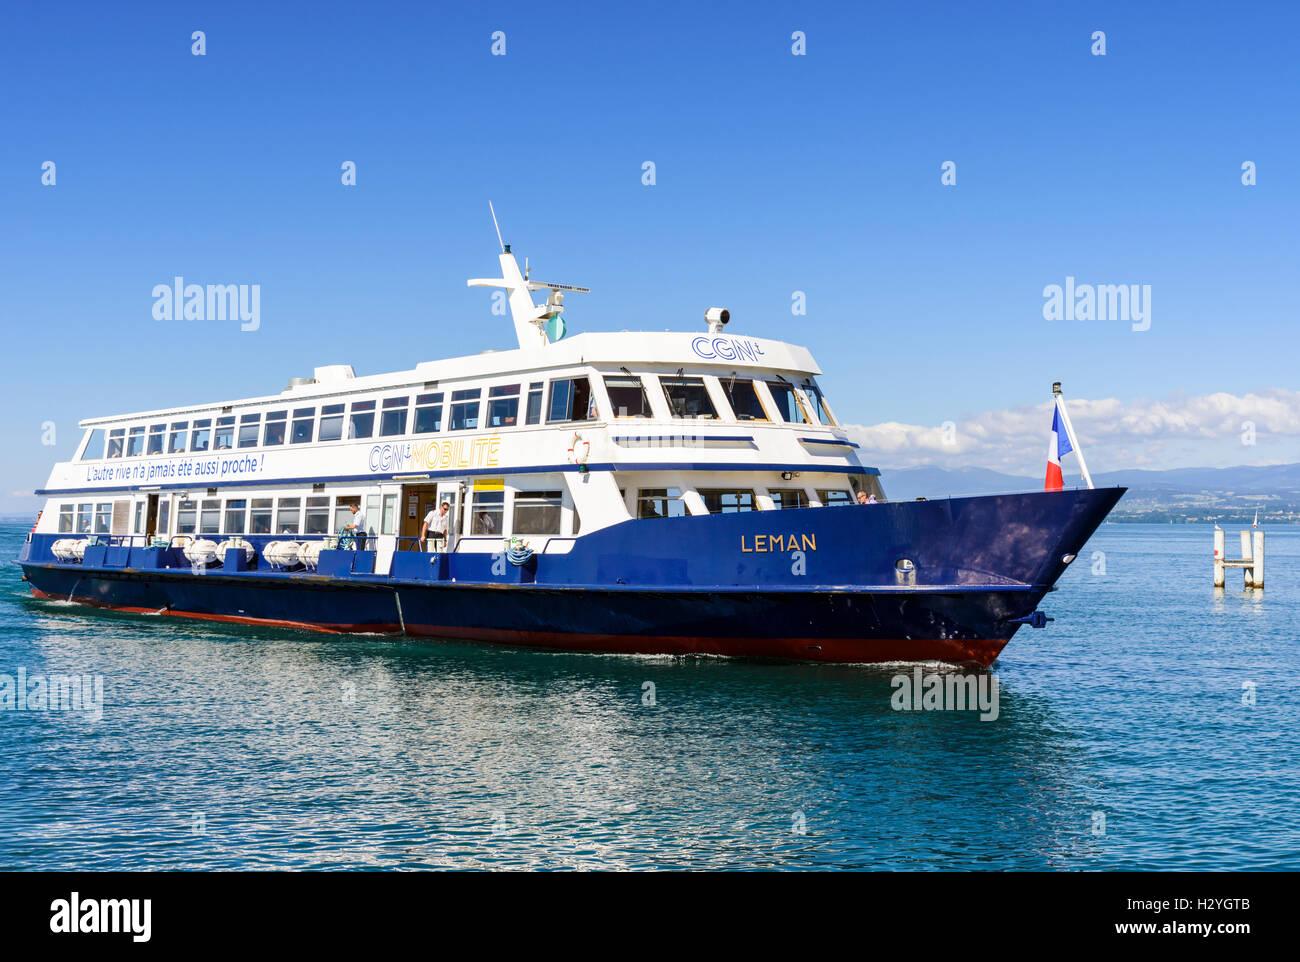 CGN Leman, a modern diesel passenger boat approaching Ouchy, Lausanne, Vaud, Switzerland Stock Photo